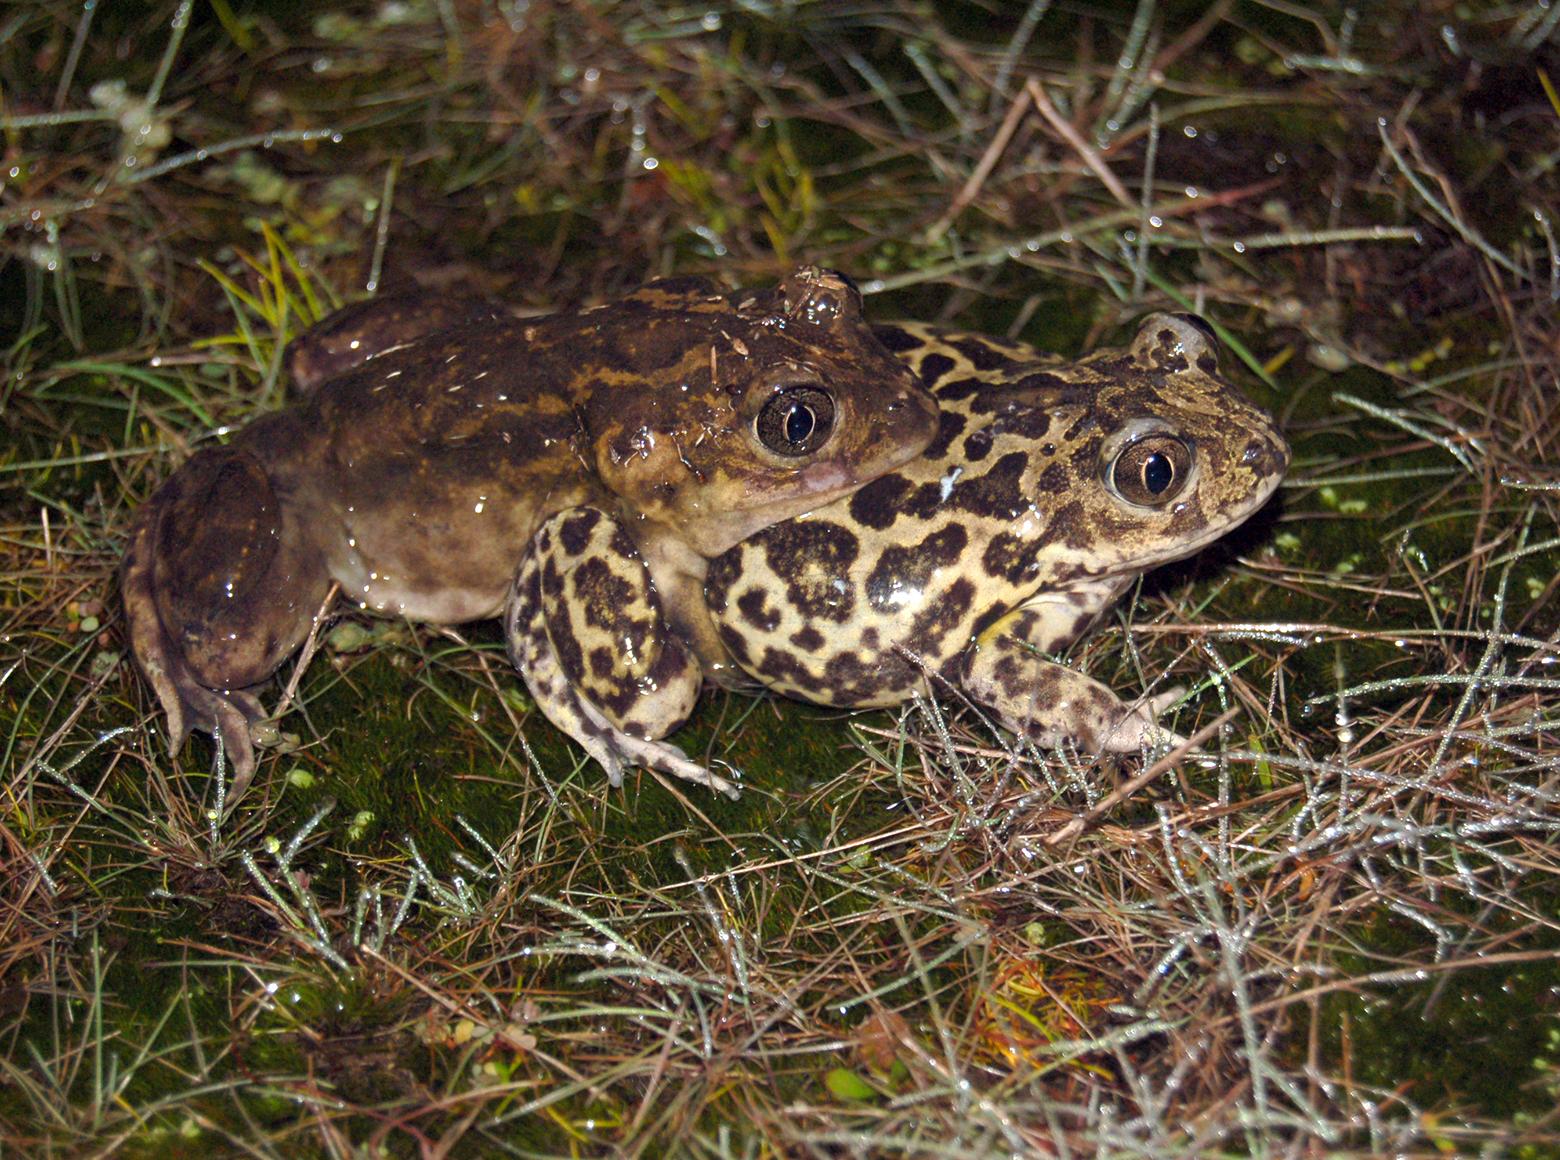 Pair of Pelobates toads